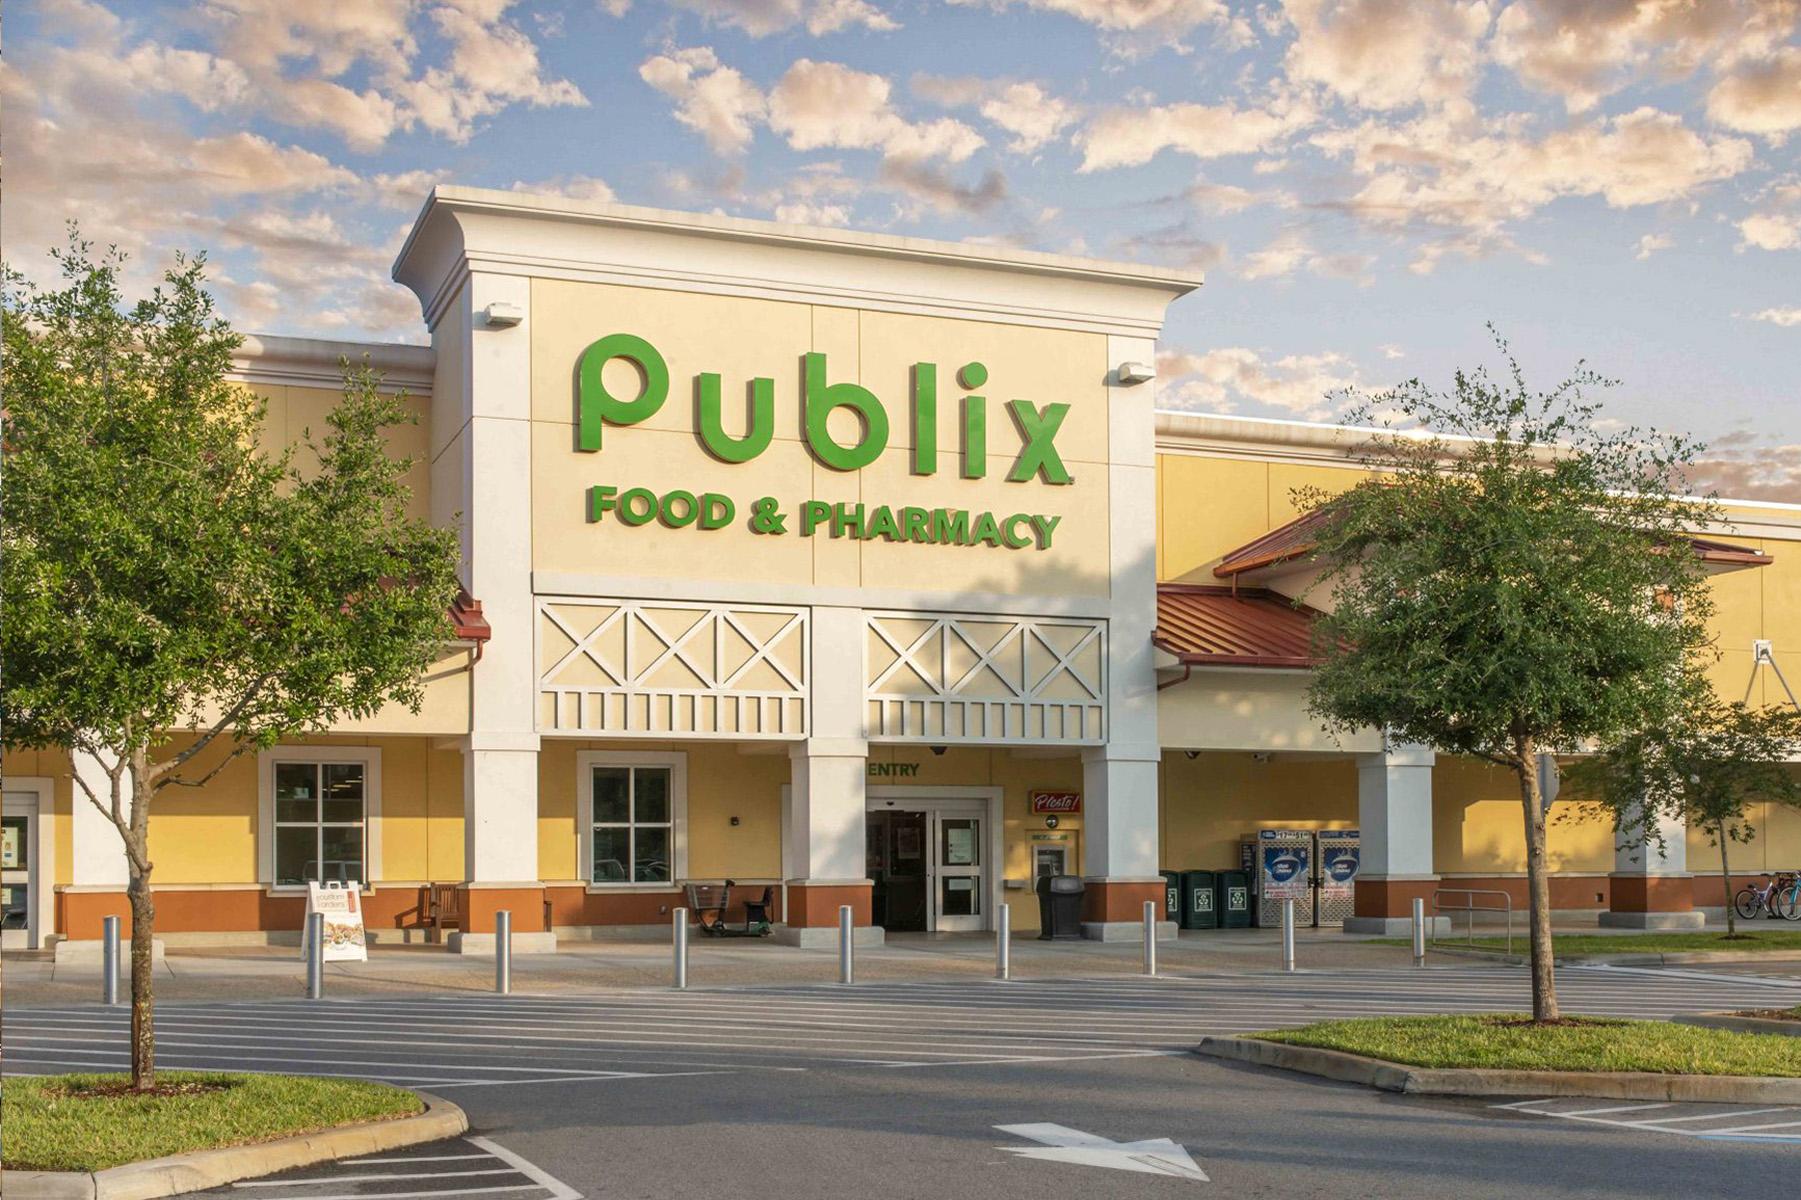 Publix Food & Pharmacy Store Exterior